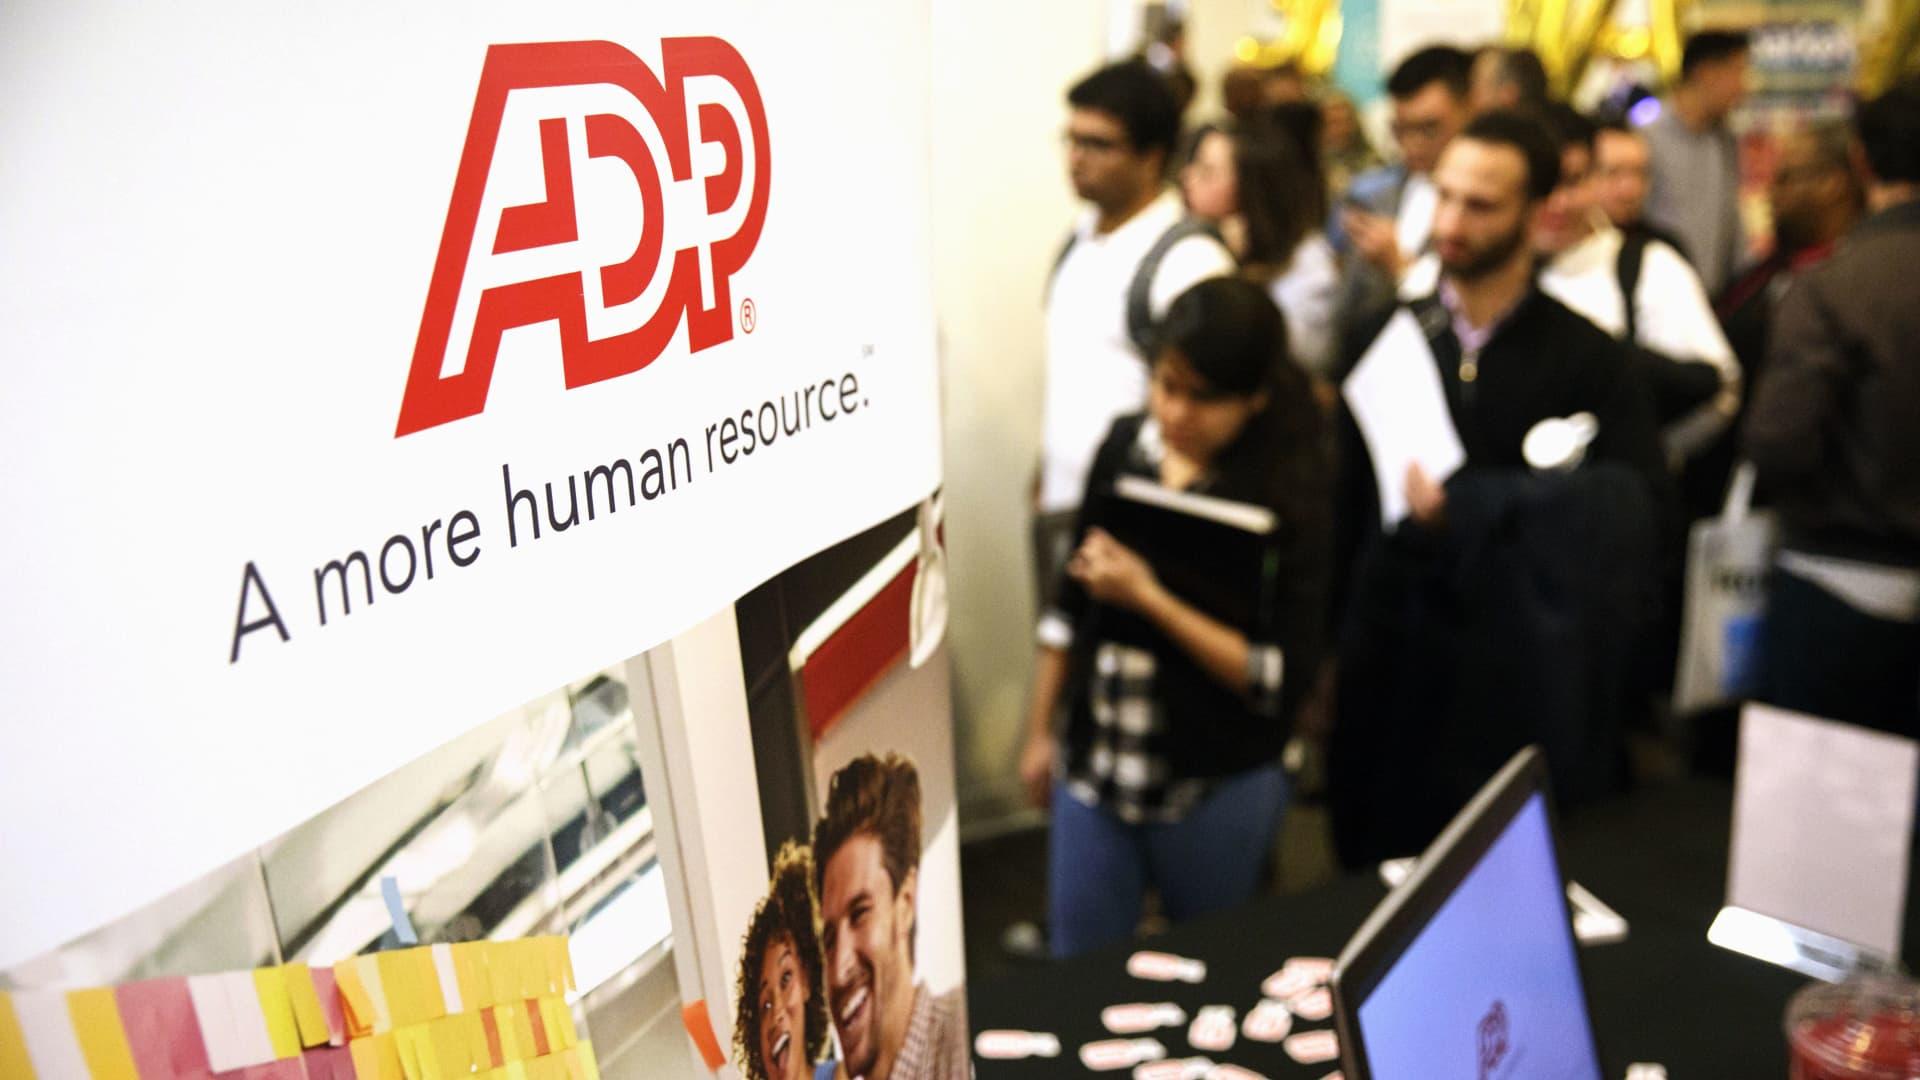 ADP LLC signage is displayed as job seekers wait in line during the TechFair LA job fair in Los Angeles, California.